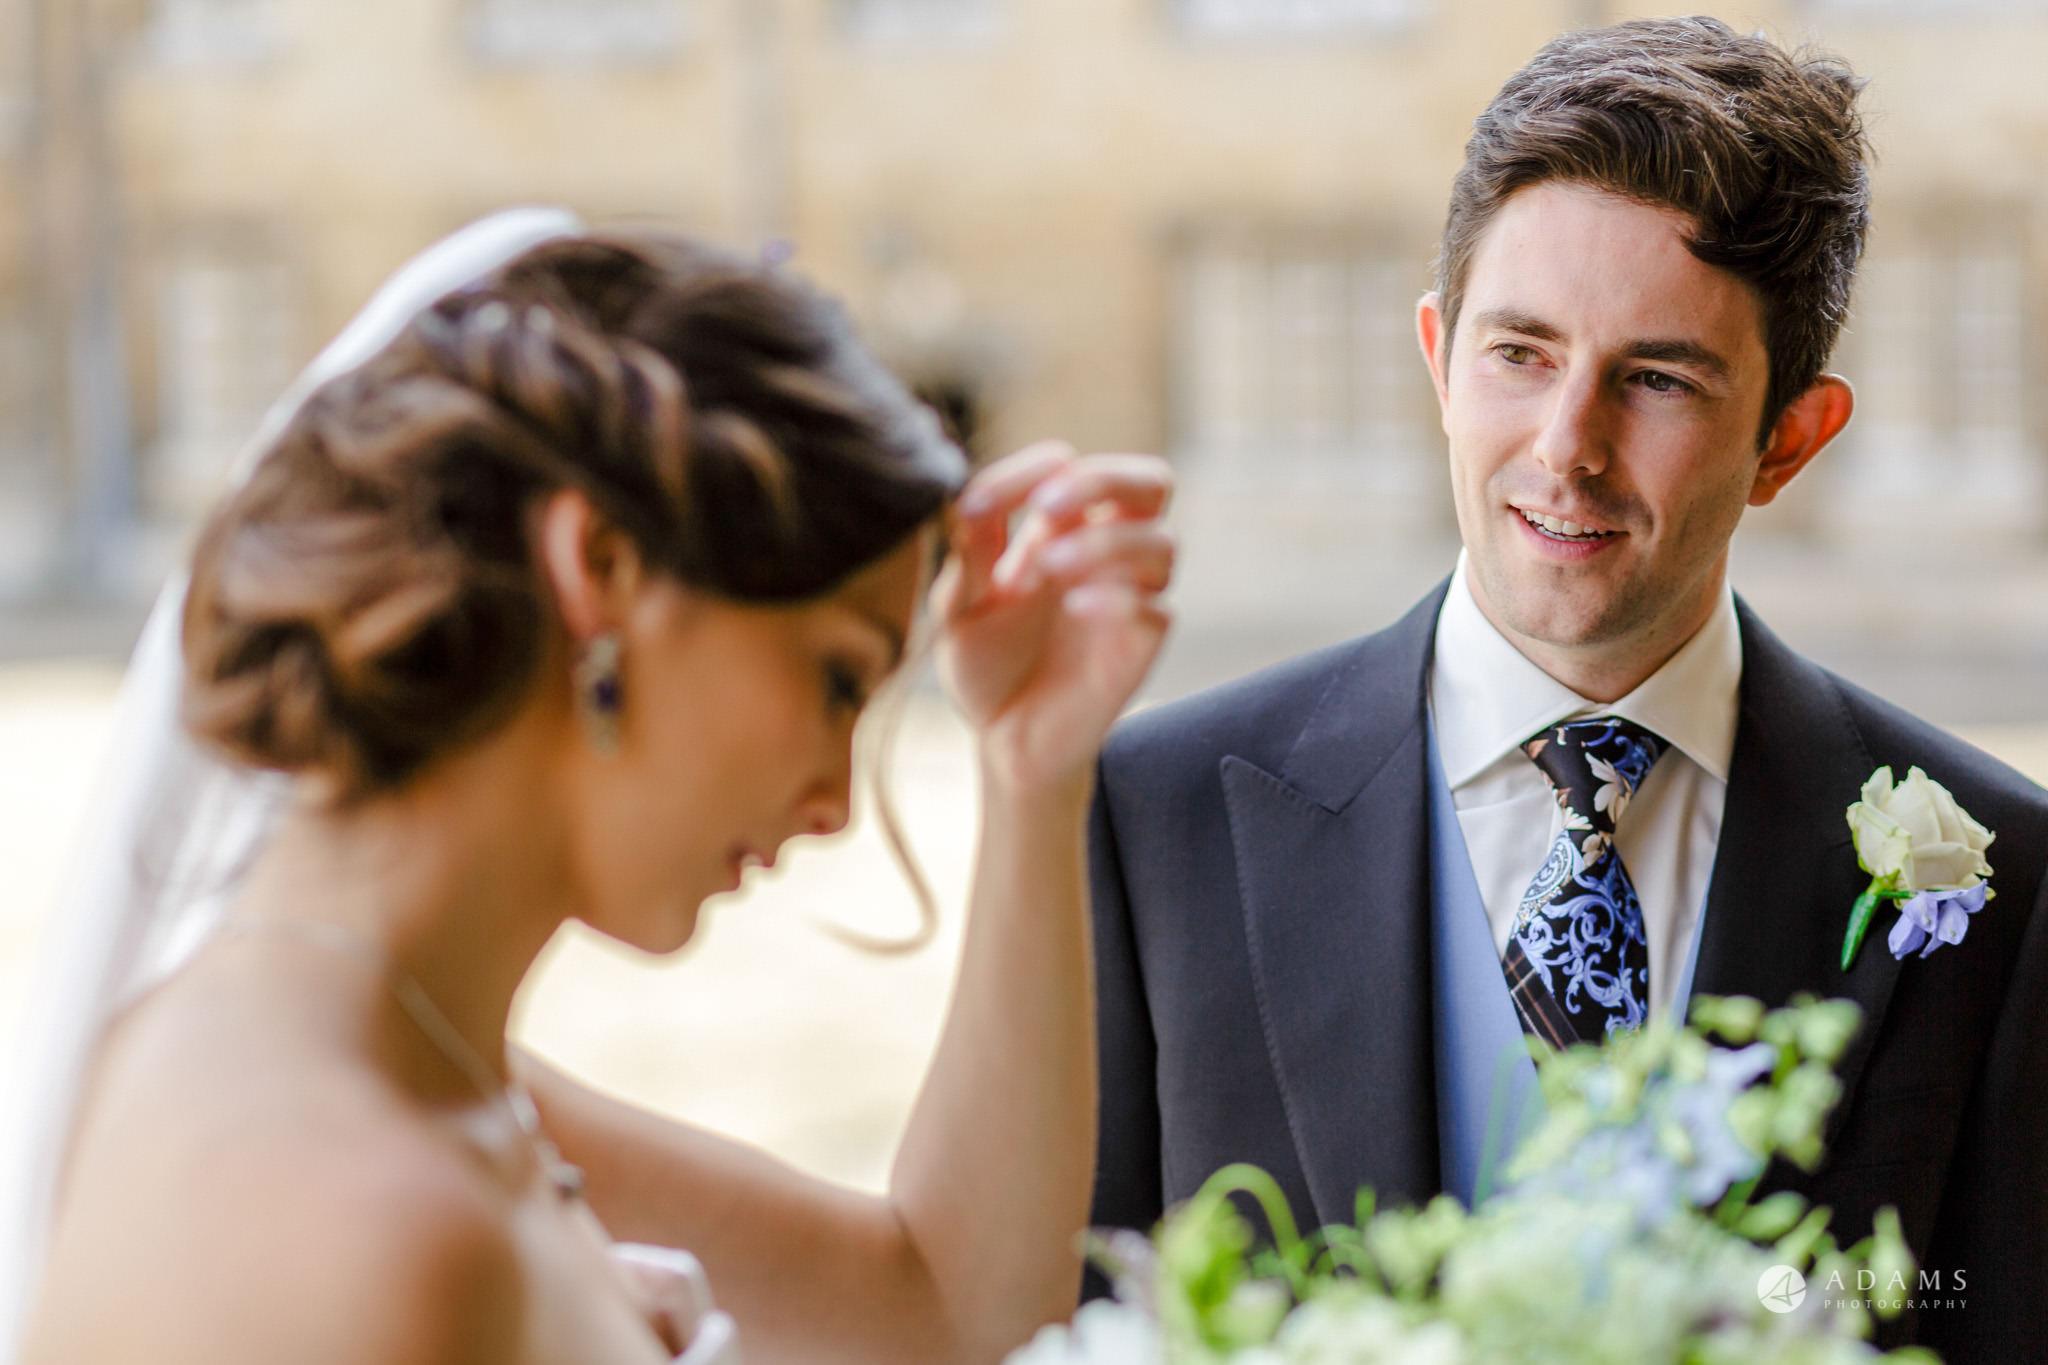 Trinity College Cambridge wedding bride and groom private moment